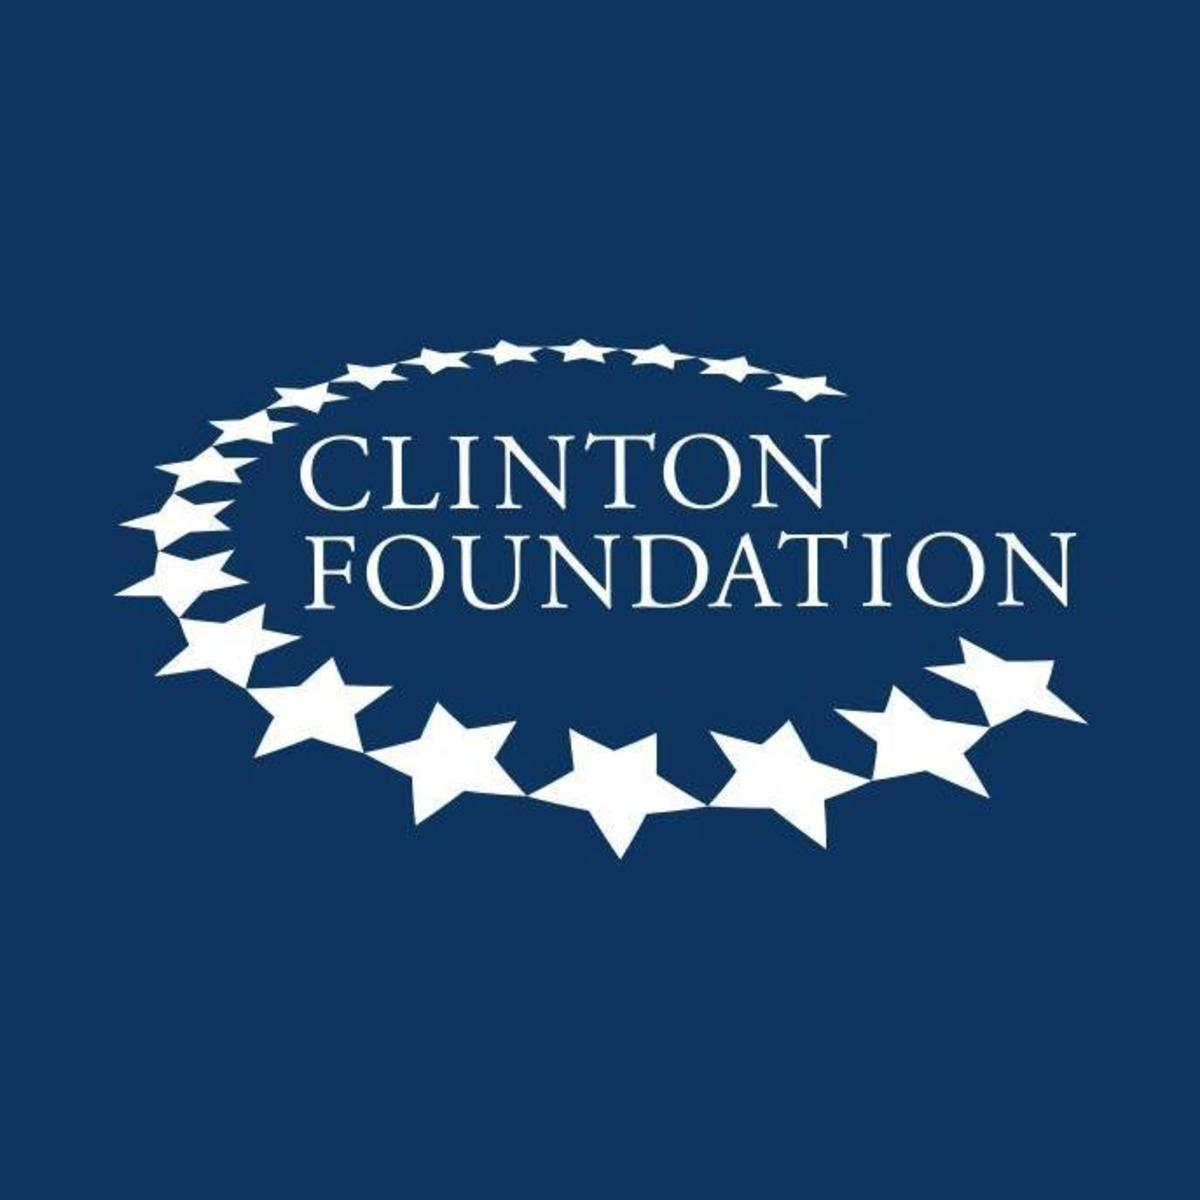 the-clinton-fiundation-a-conduit-for-corr